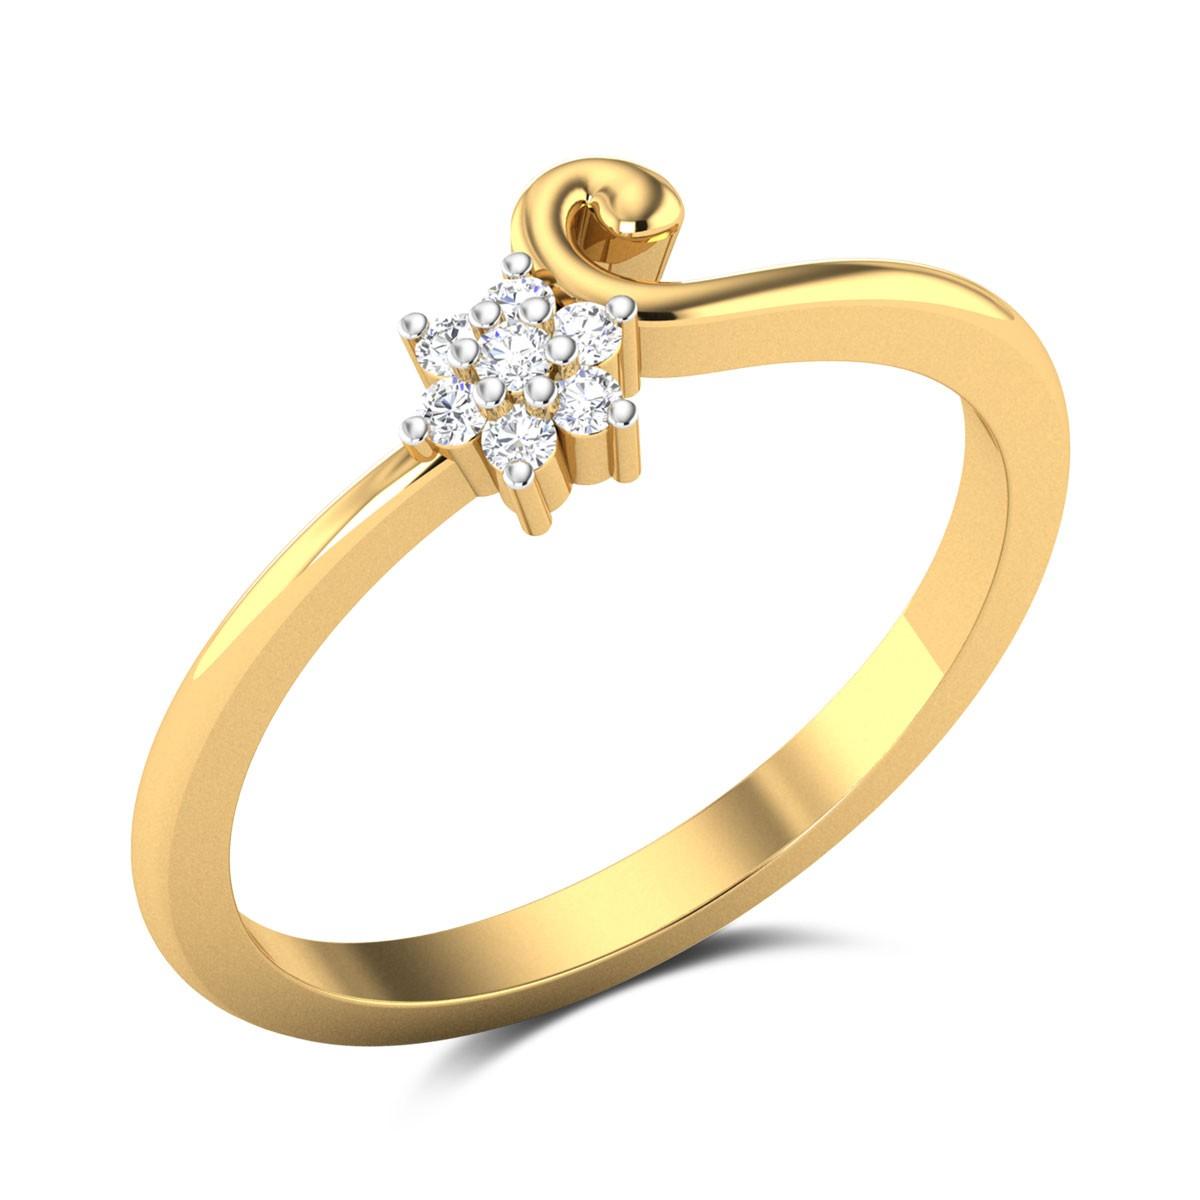 Paige Diamond Ring